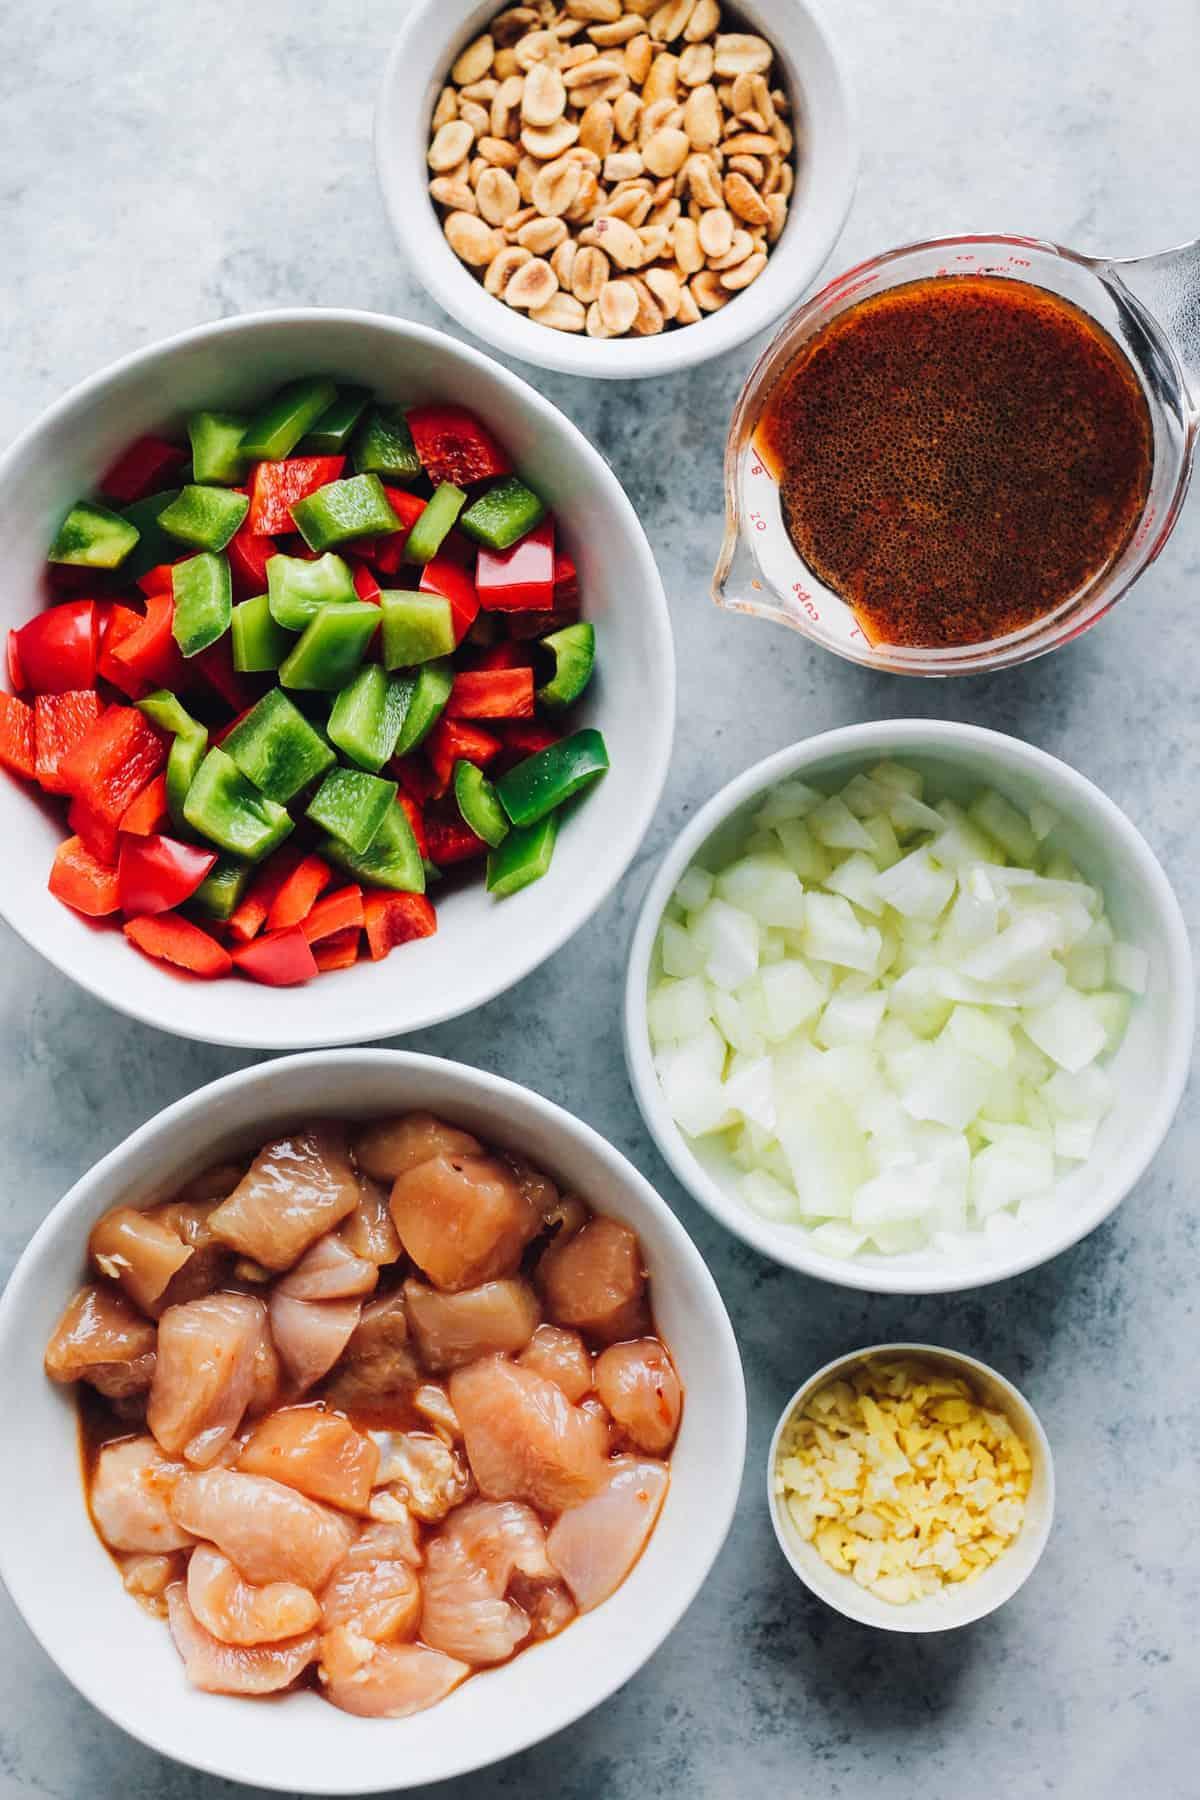 ingredients to make kung pao chicken recipe